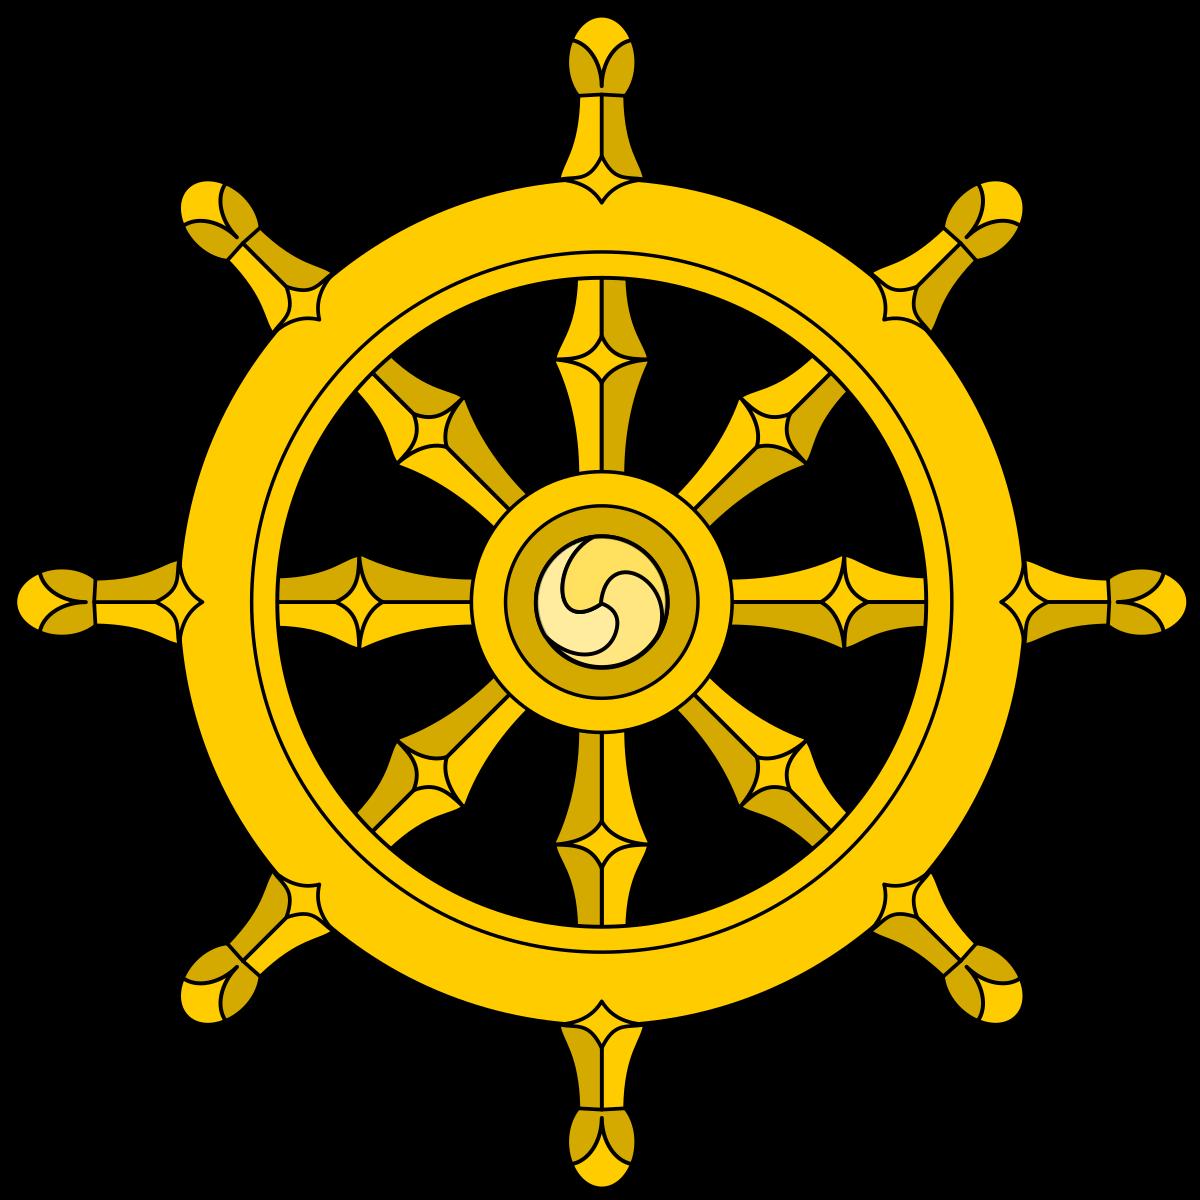 Karma Kagyu Institusi Agama Buddha di Asia Mengenai Jalan Mulia Unsur Delapan